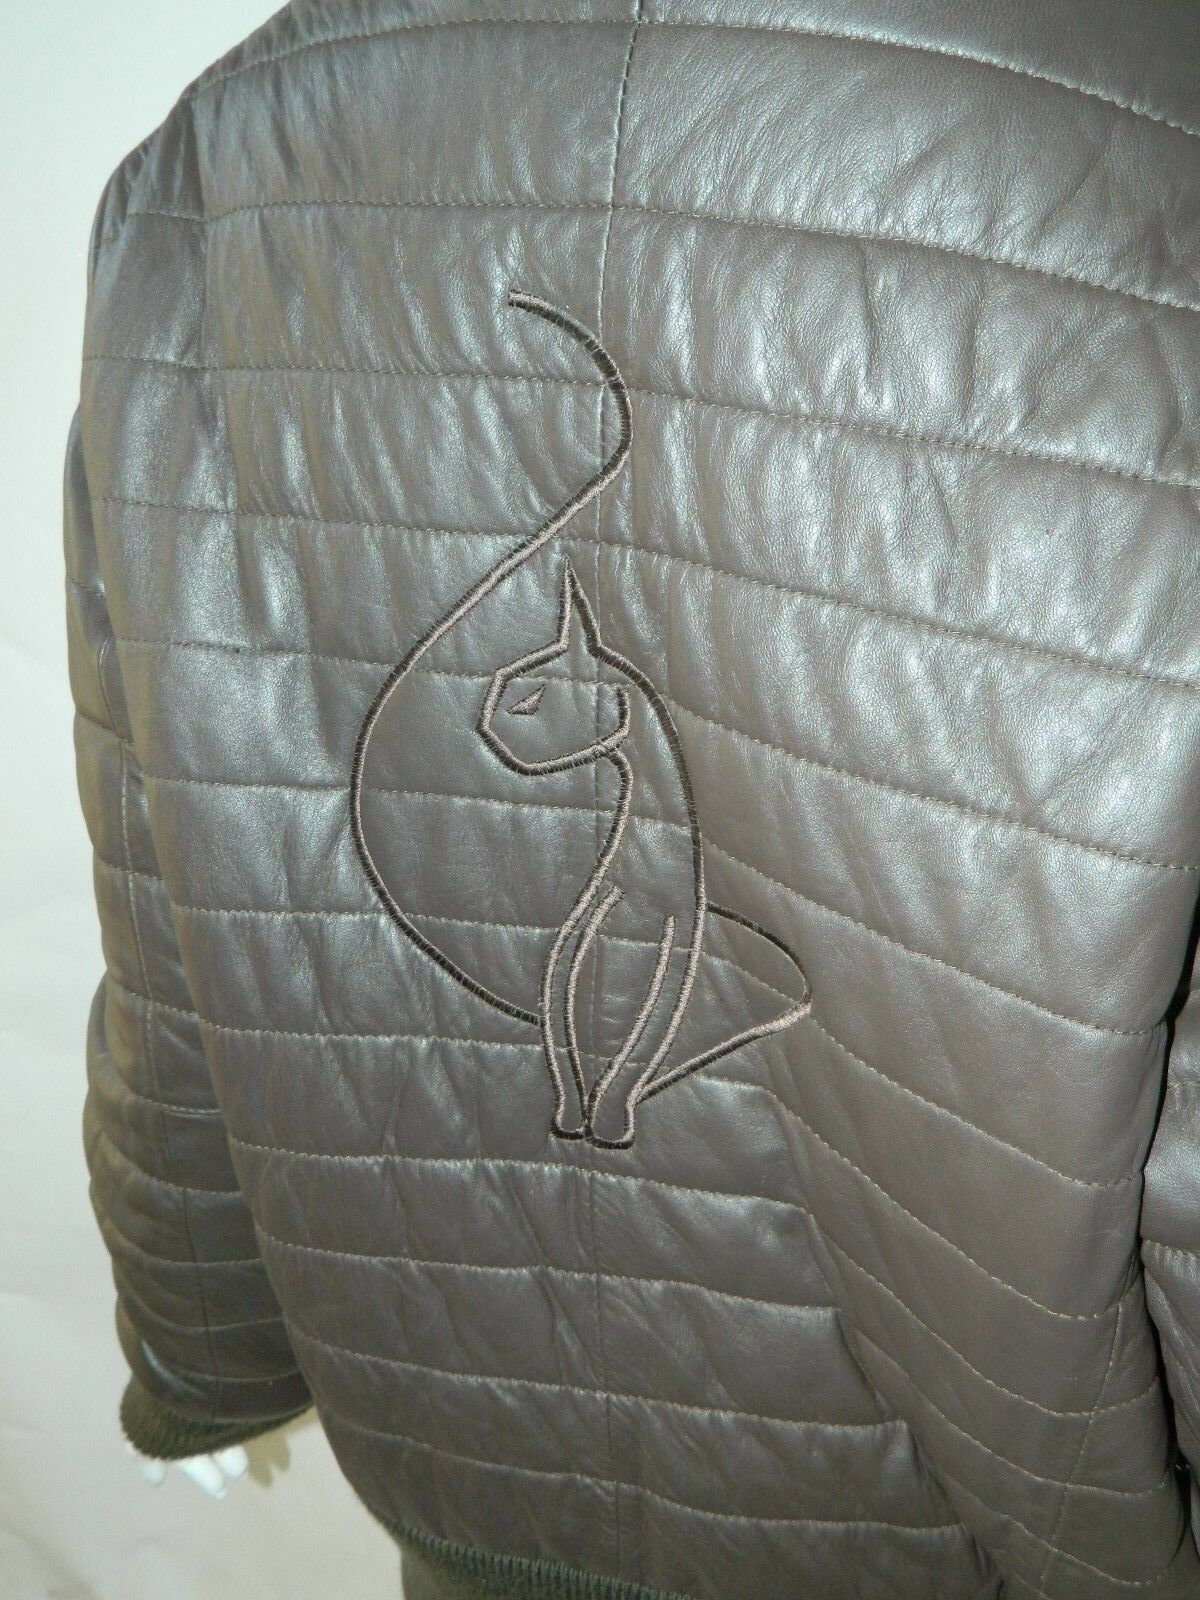 BABY PHAT Jacket Puffer Leather Kimora Lee Simmons Brown Coat XX-Large image 4